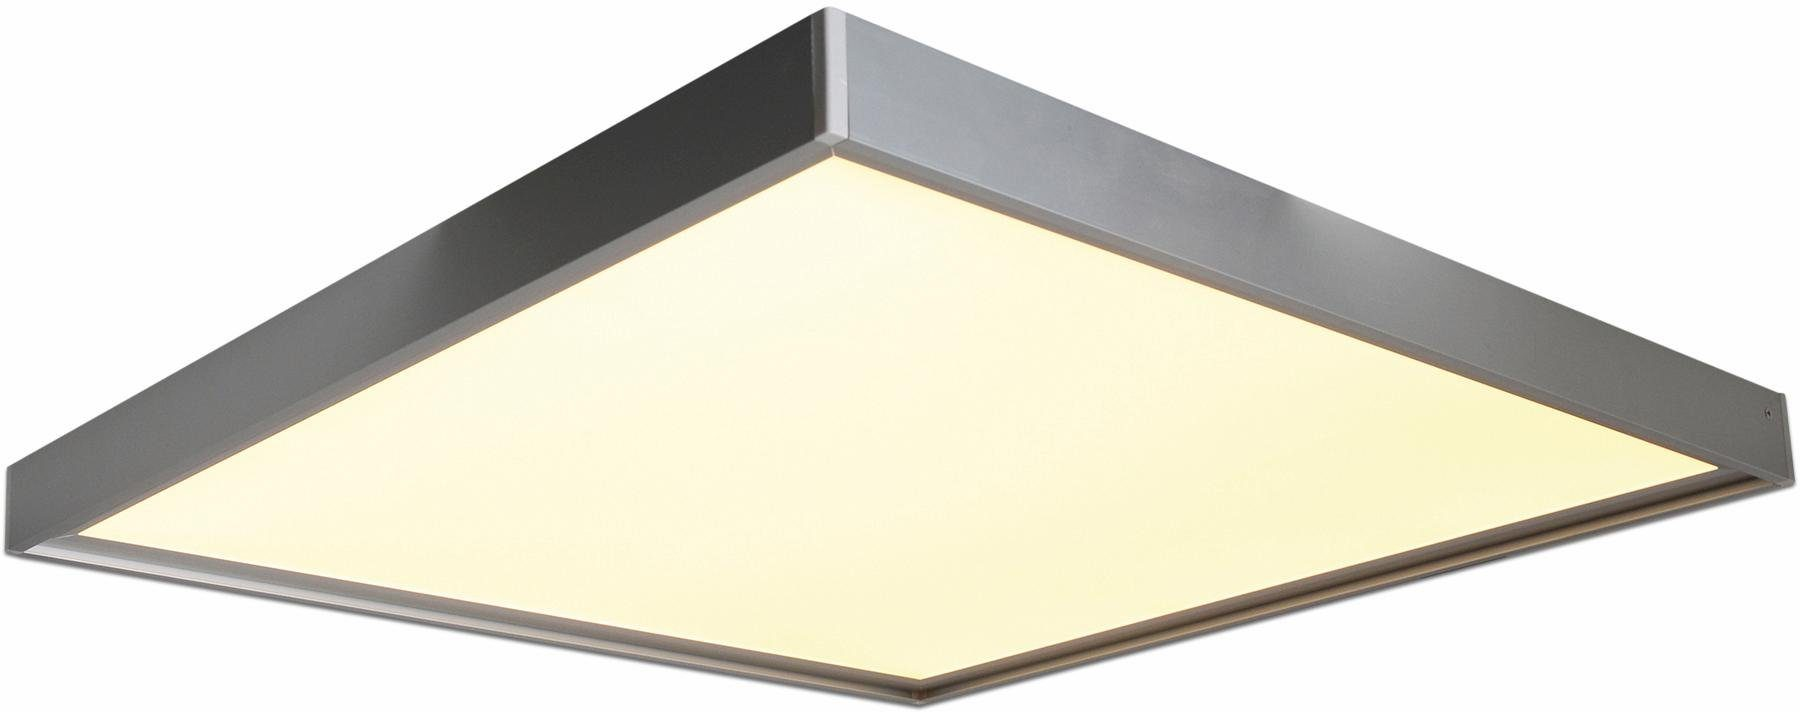 Näve LED Panel, 62 x 62 cm